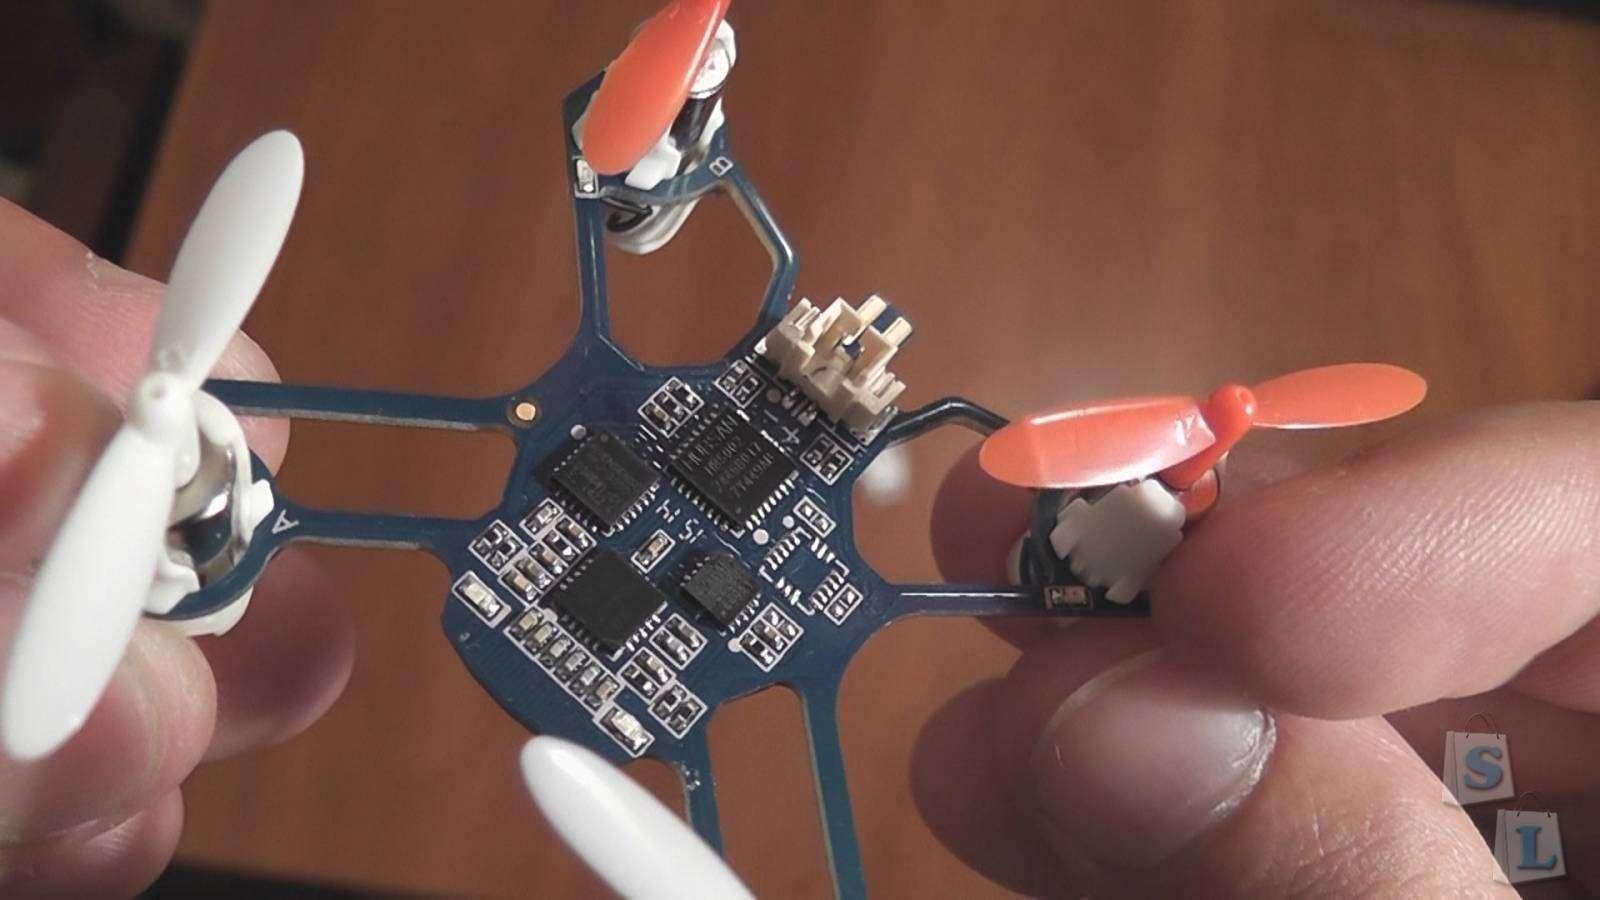 CooliCool: Hubsan Nano Q4 (H111) 2.4GHz, 4Ch, 6 Axis Gyro, RC Quadcopter (RTF) и Кот